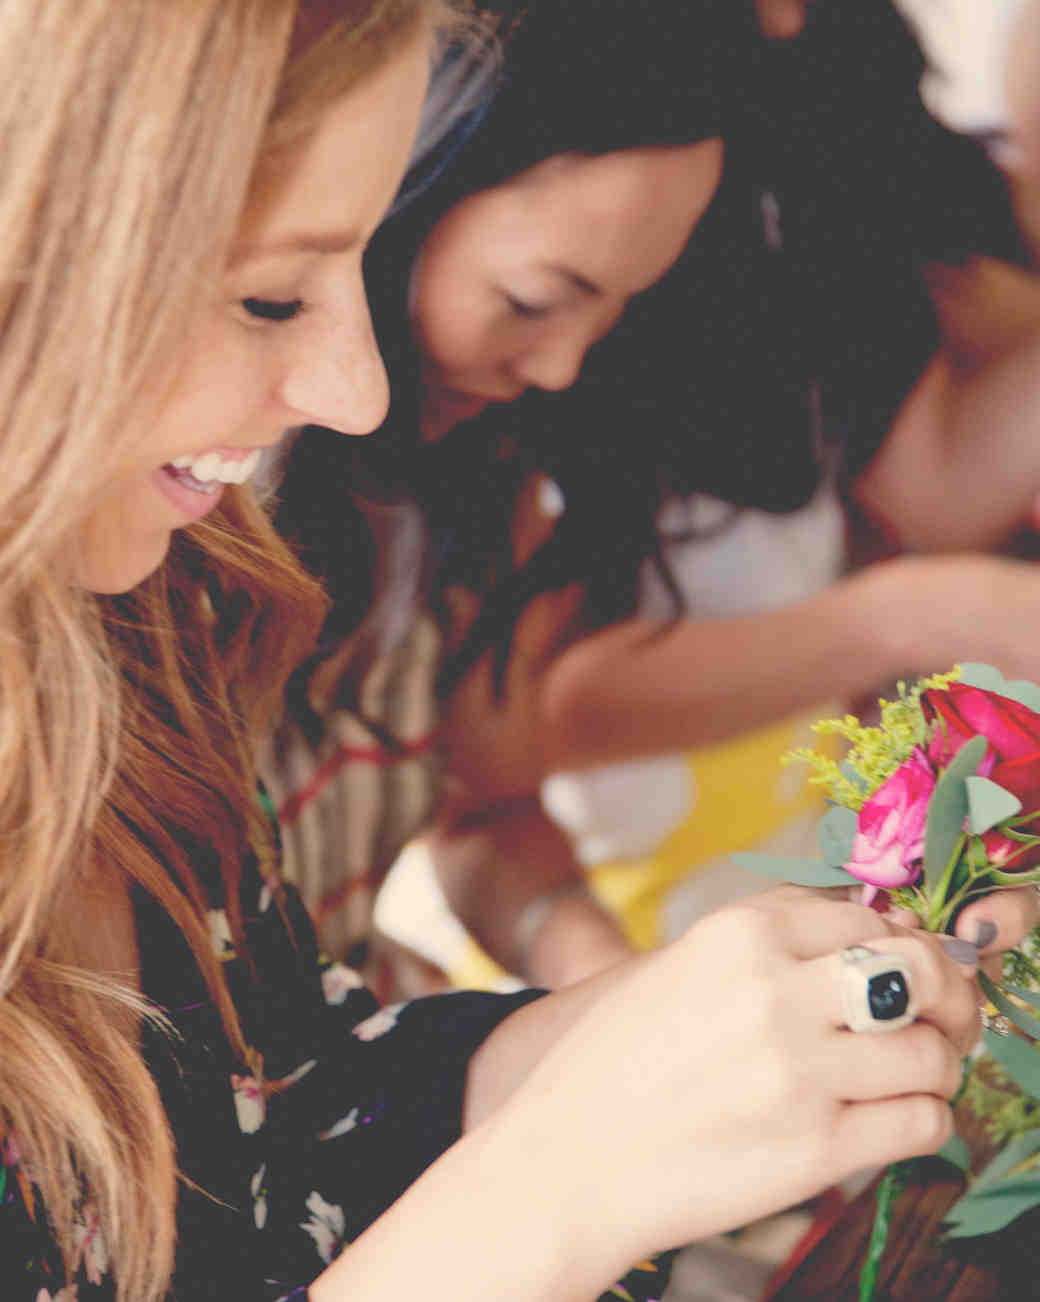 claire-thomas-bridal-shower-boho-friends-smiling-crafts-0814.jpg